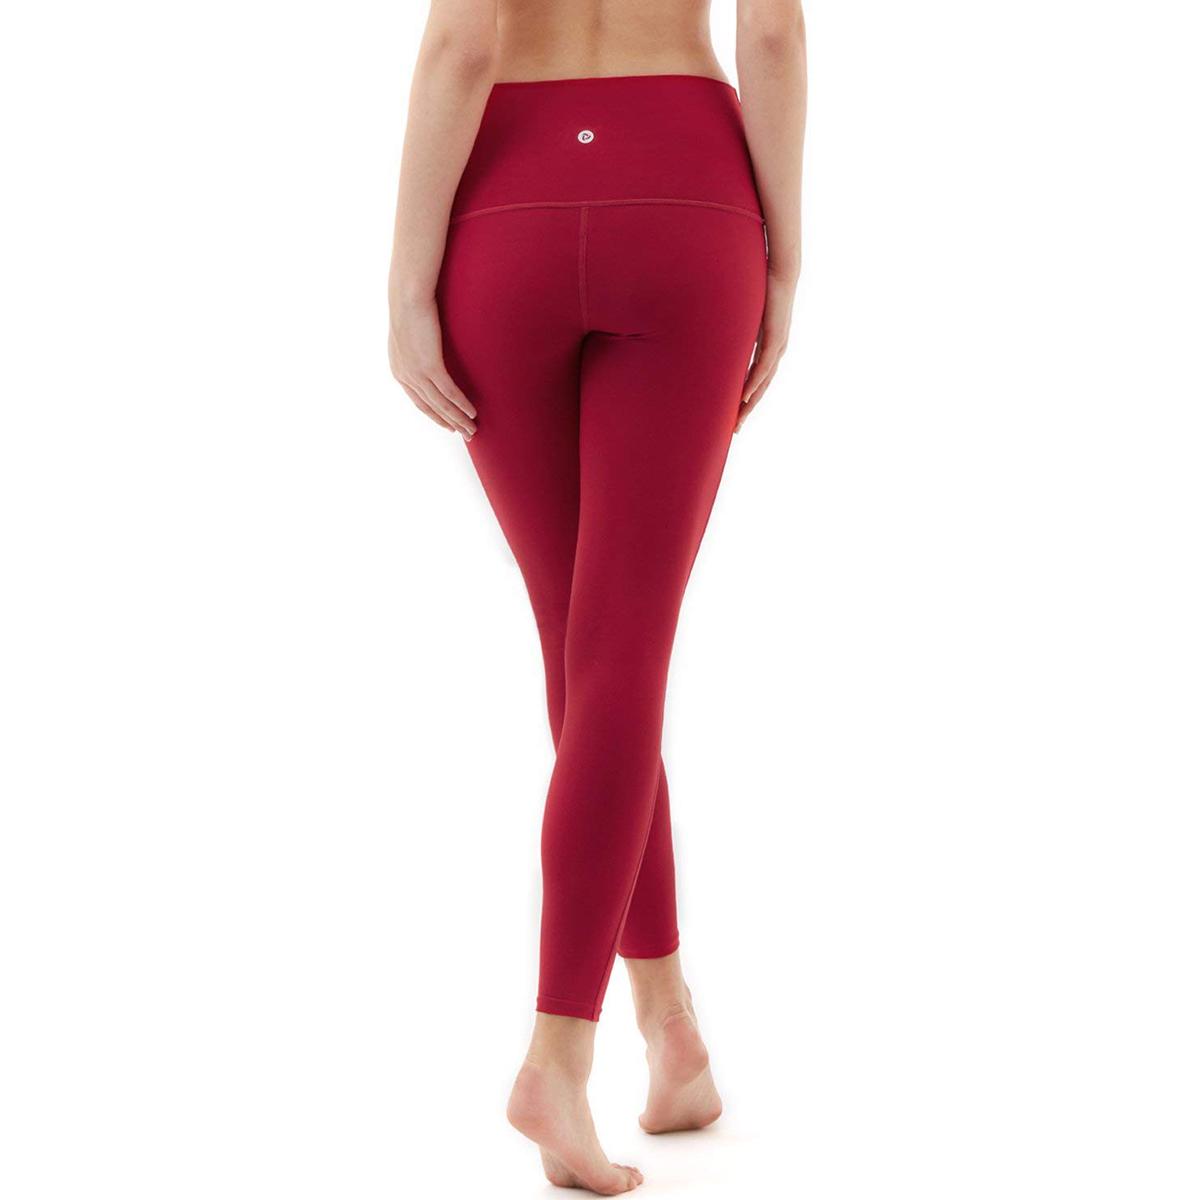 thumbnail 27 - TSLA Tesla FYP52 Women's High-Waisted Ultra-Stretch Tummy Control Yoga Pants